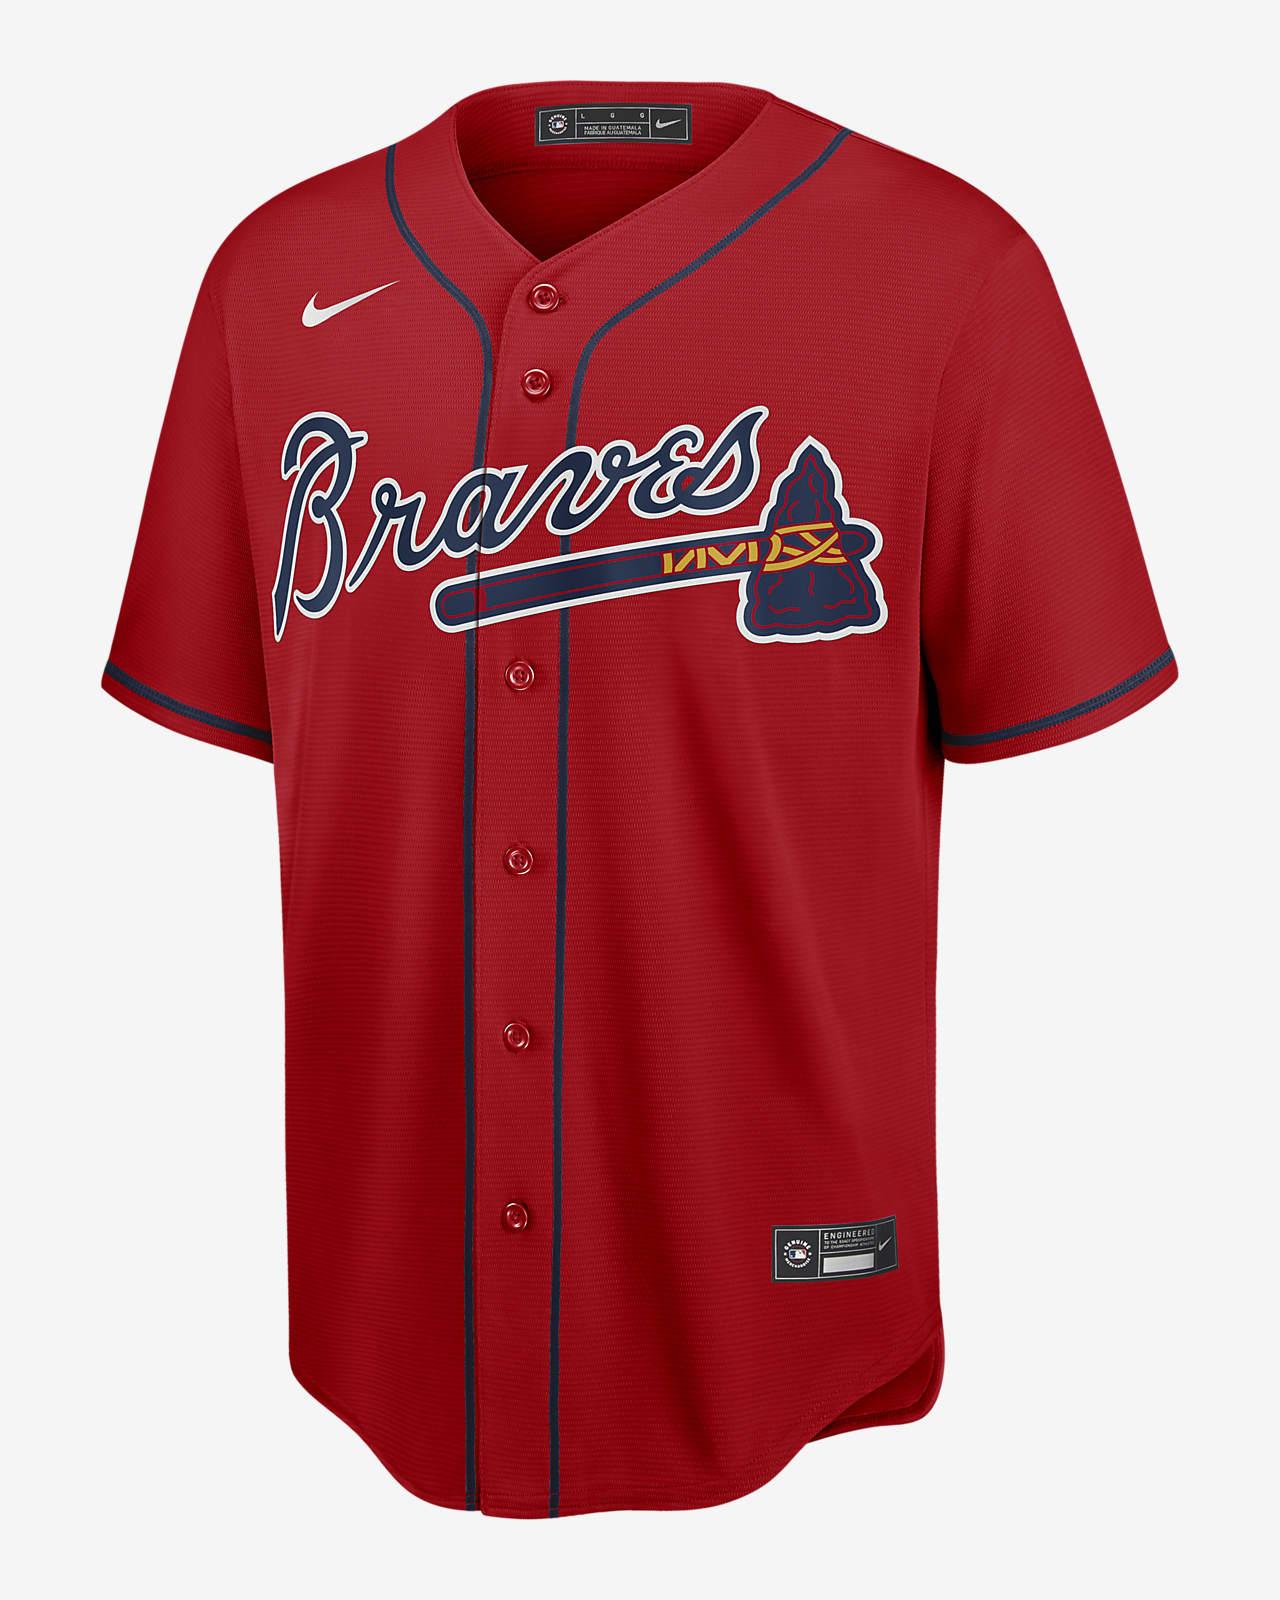 MLB Atlanta Braves (Freddie Freeman) Men's Replica Baseball Jersey